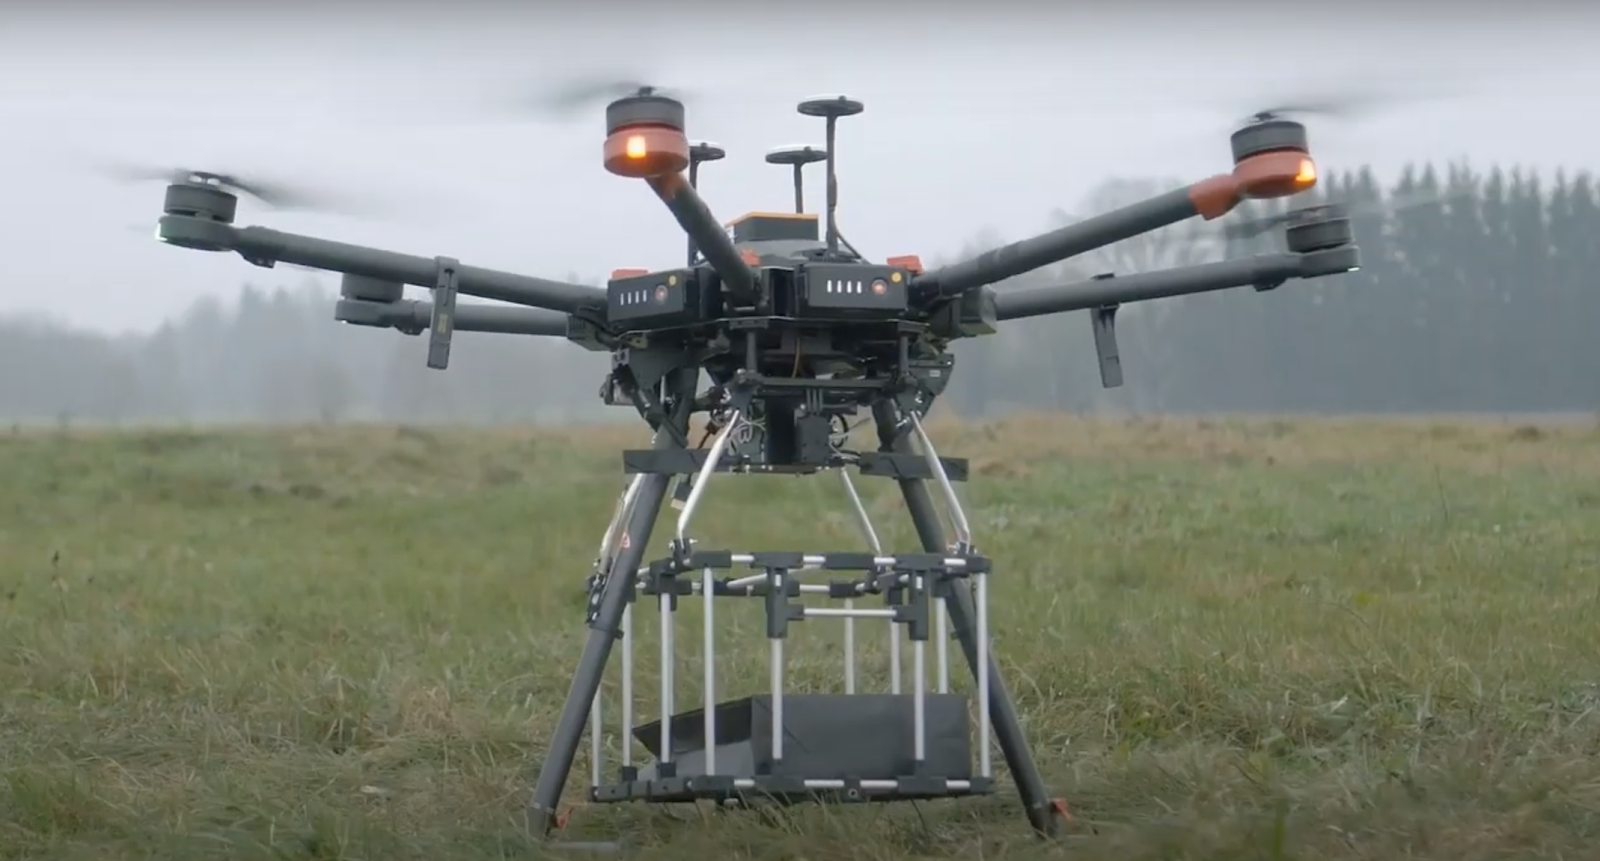 drone delivering a parcel